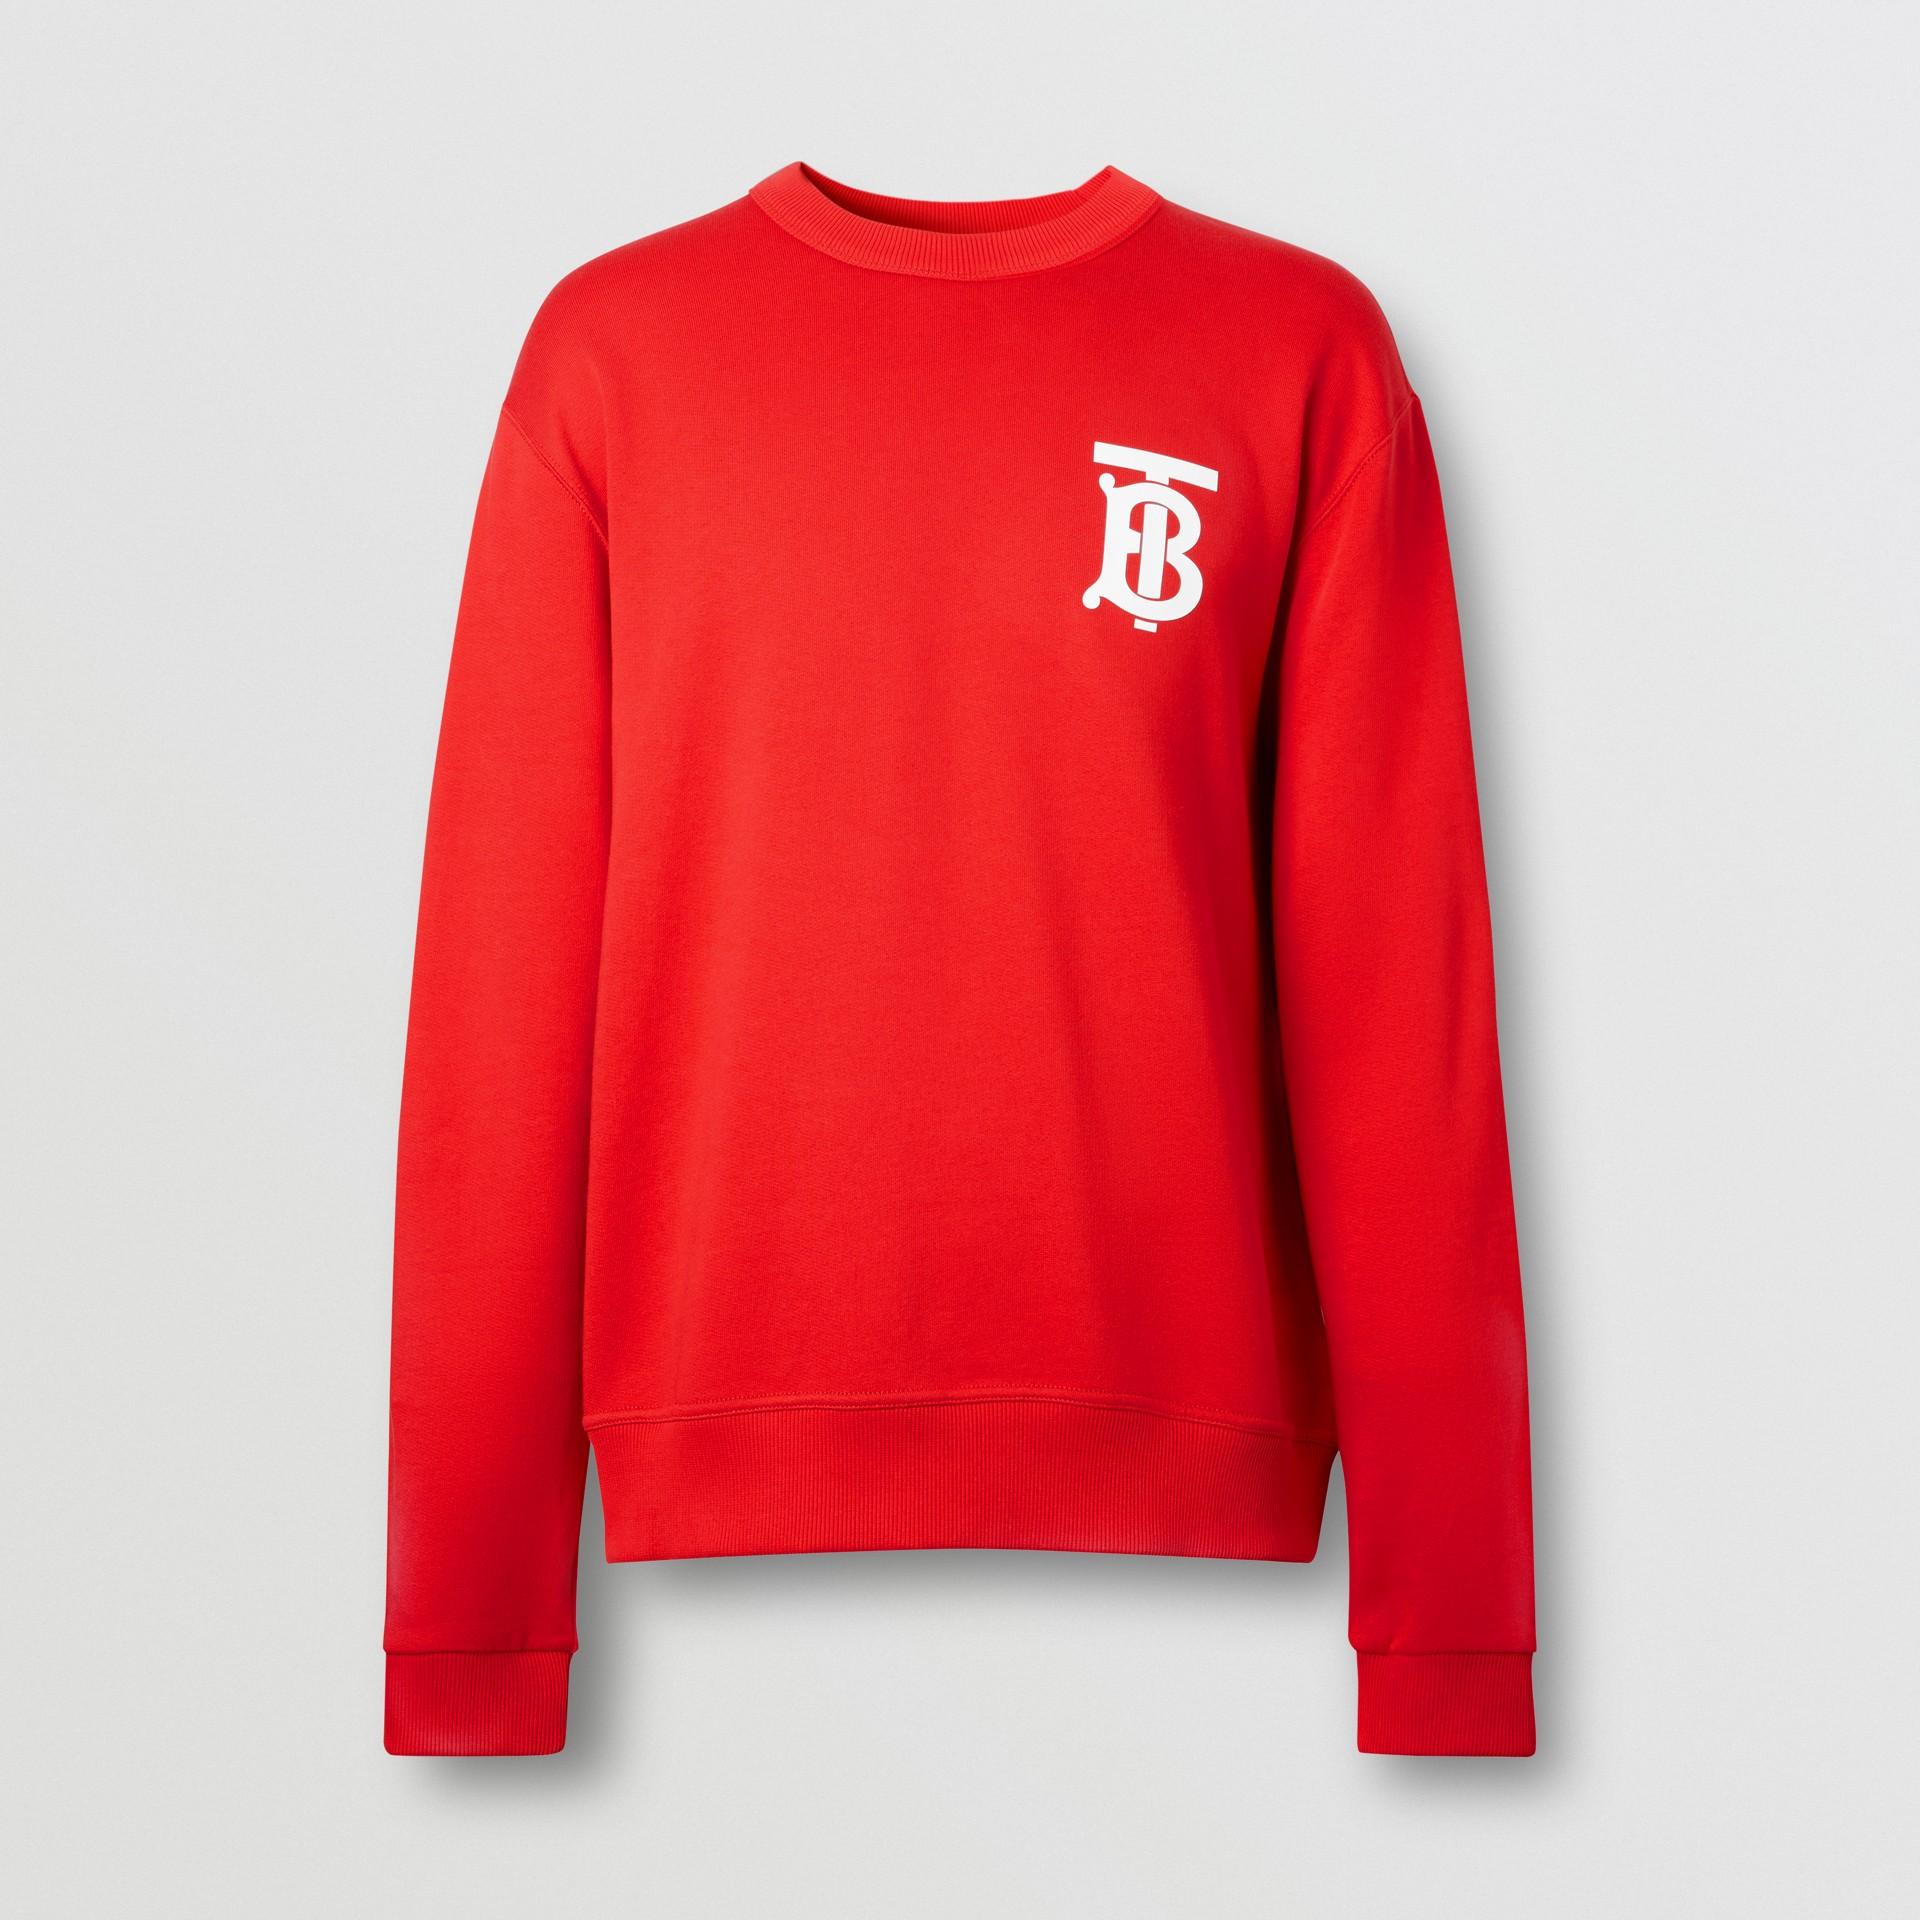 Monogram Motif Cotton Sweatshirt in Bright Red - Men | Burberry United Kingdom - gallery image 3